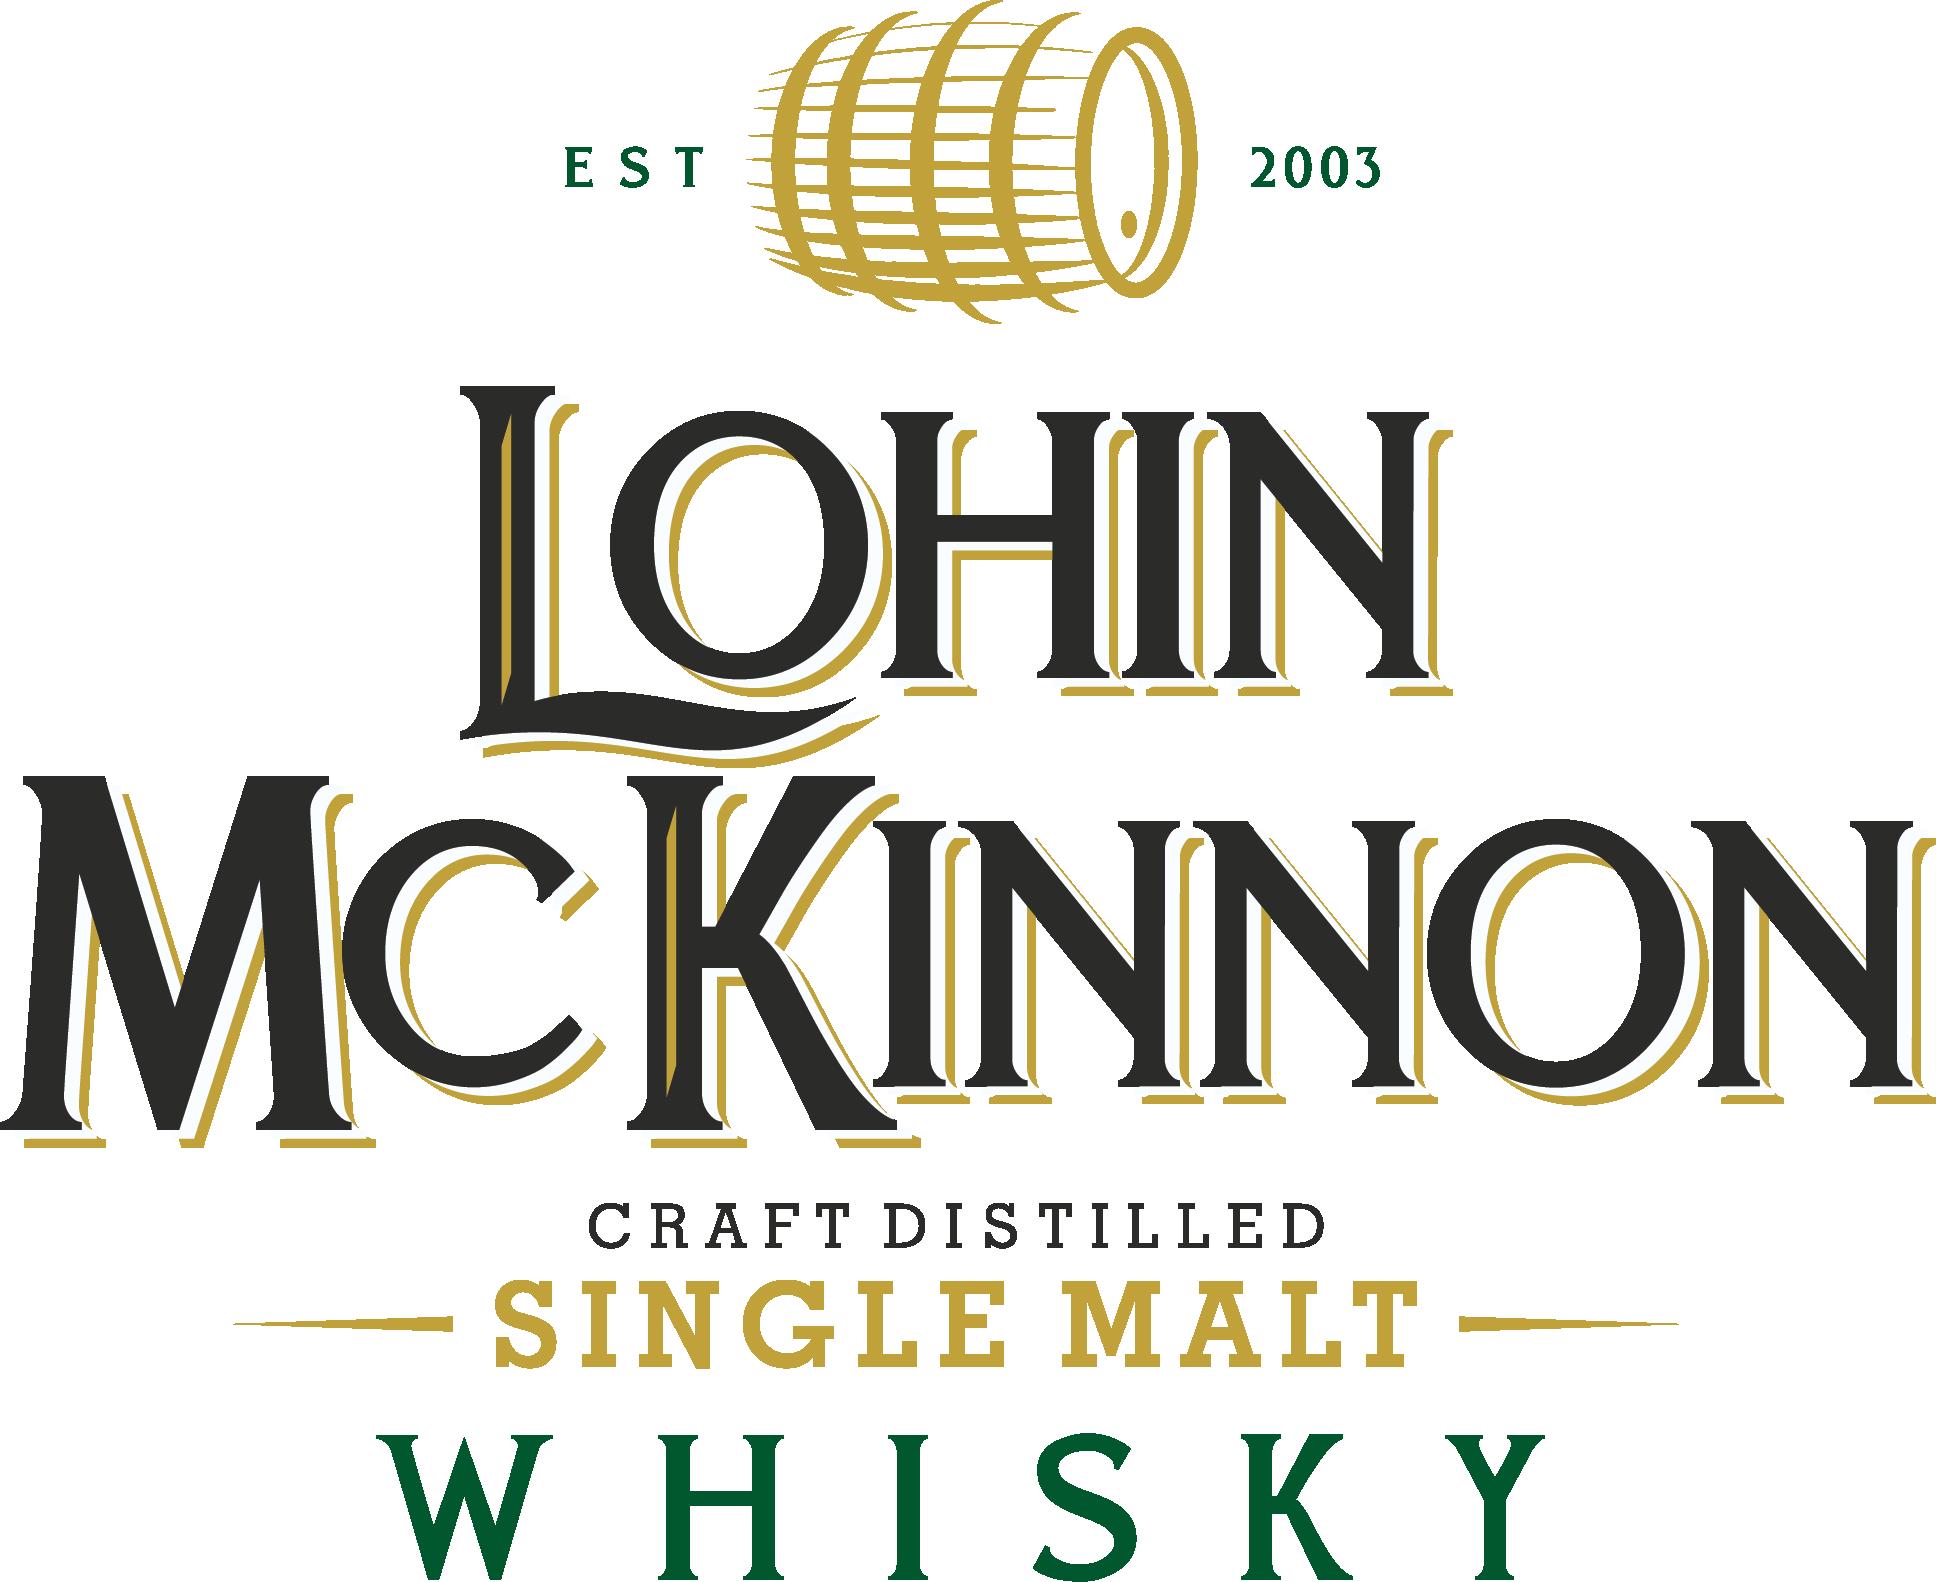 Lohin_McKinnon_Logo_colour_no_background.png